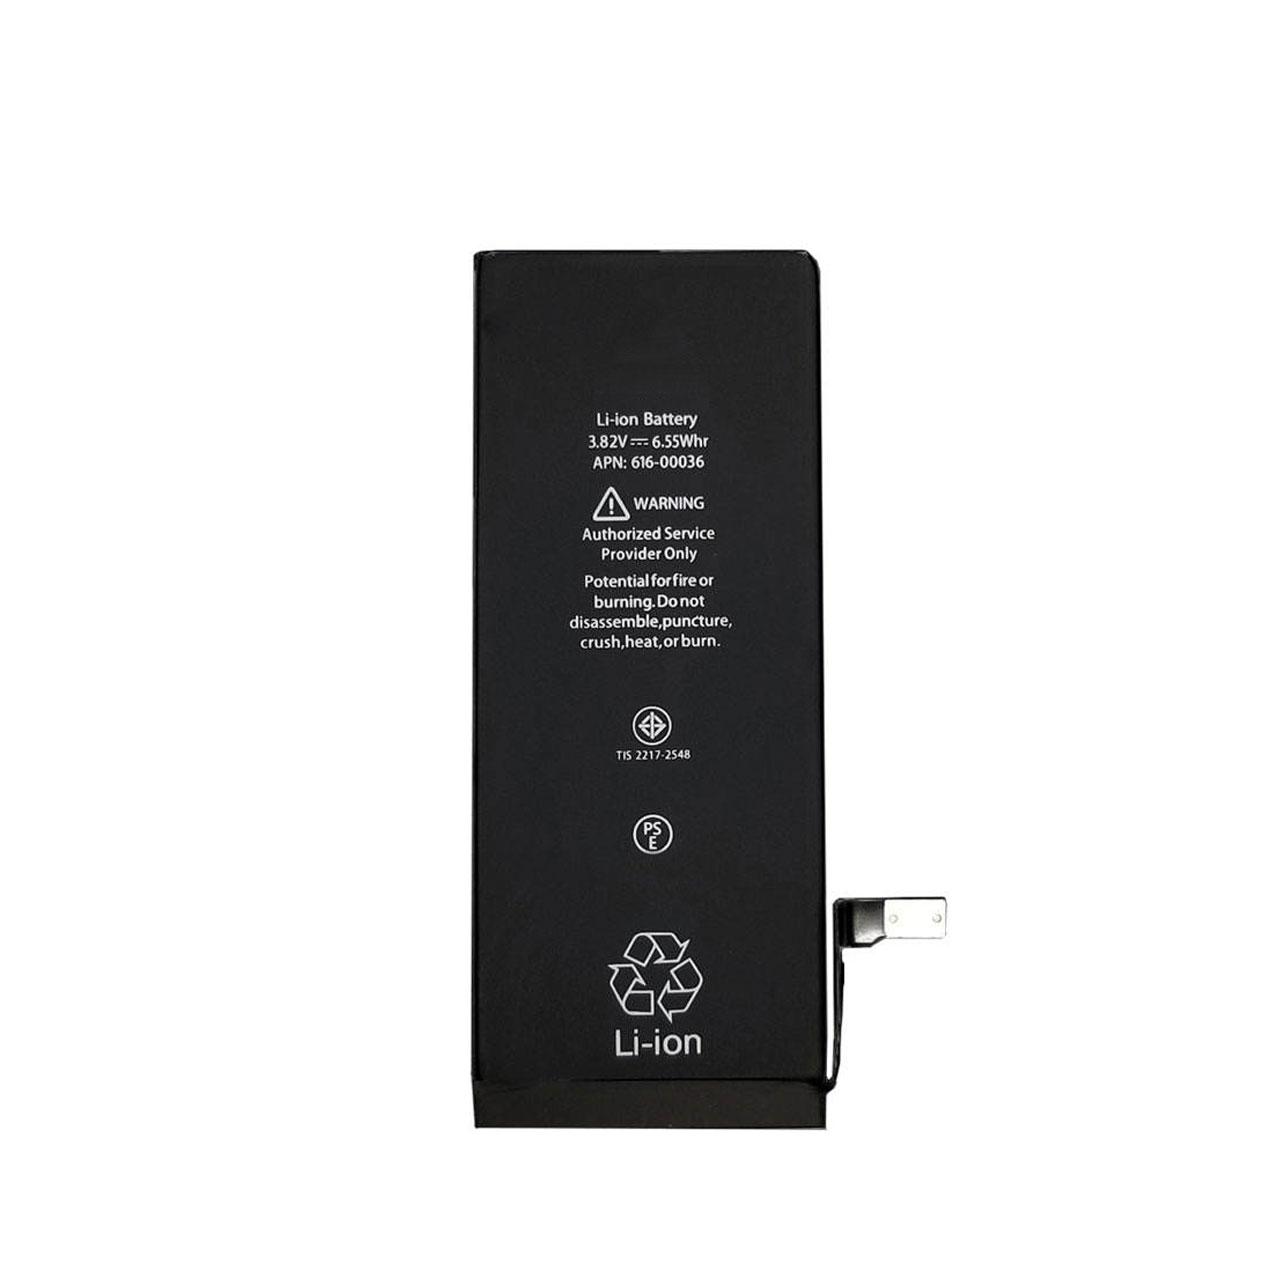 باتري موبايل مدل BTR ظرفیت 1810 میلی آمپر ساعت مناسب براي گوشي موبايل اپل iPhone 6